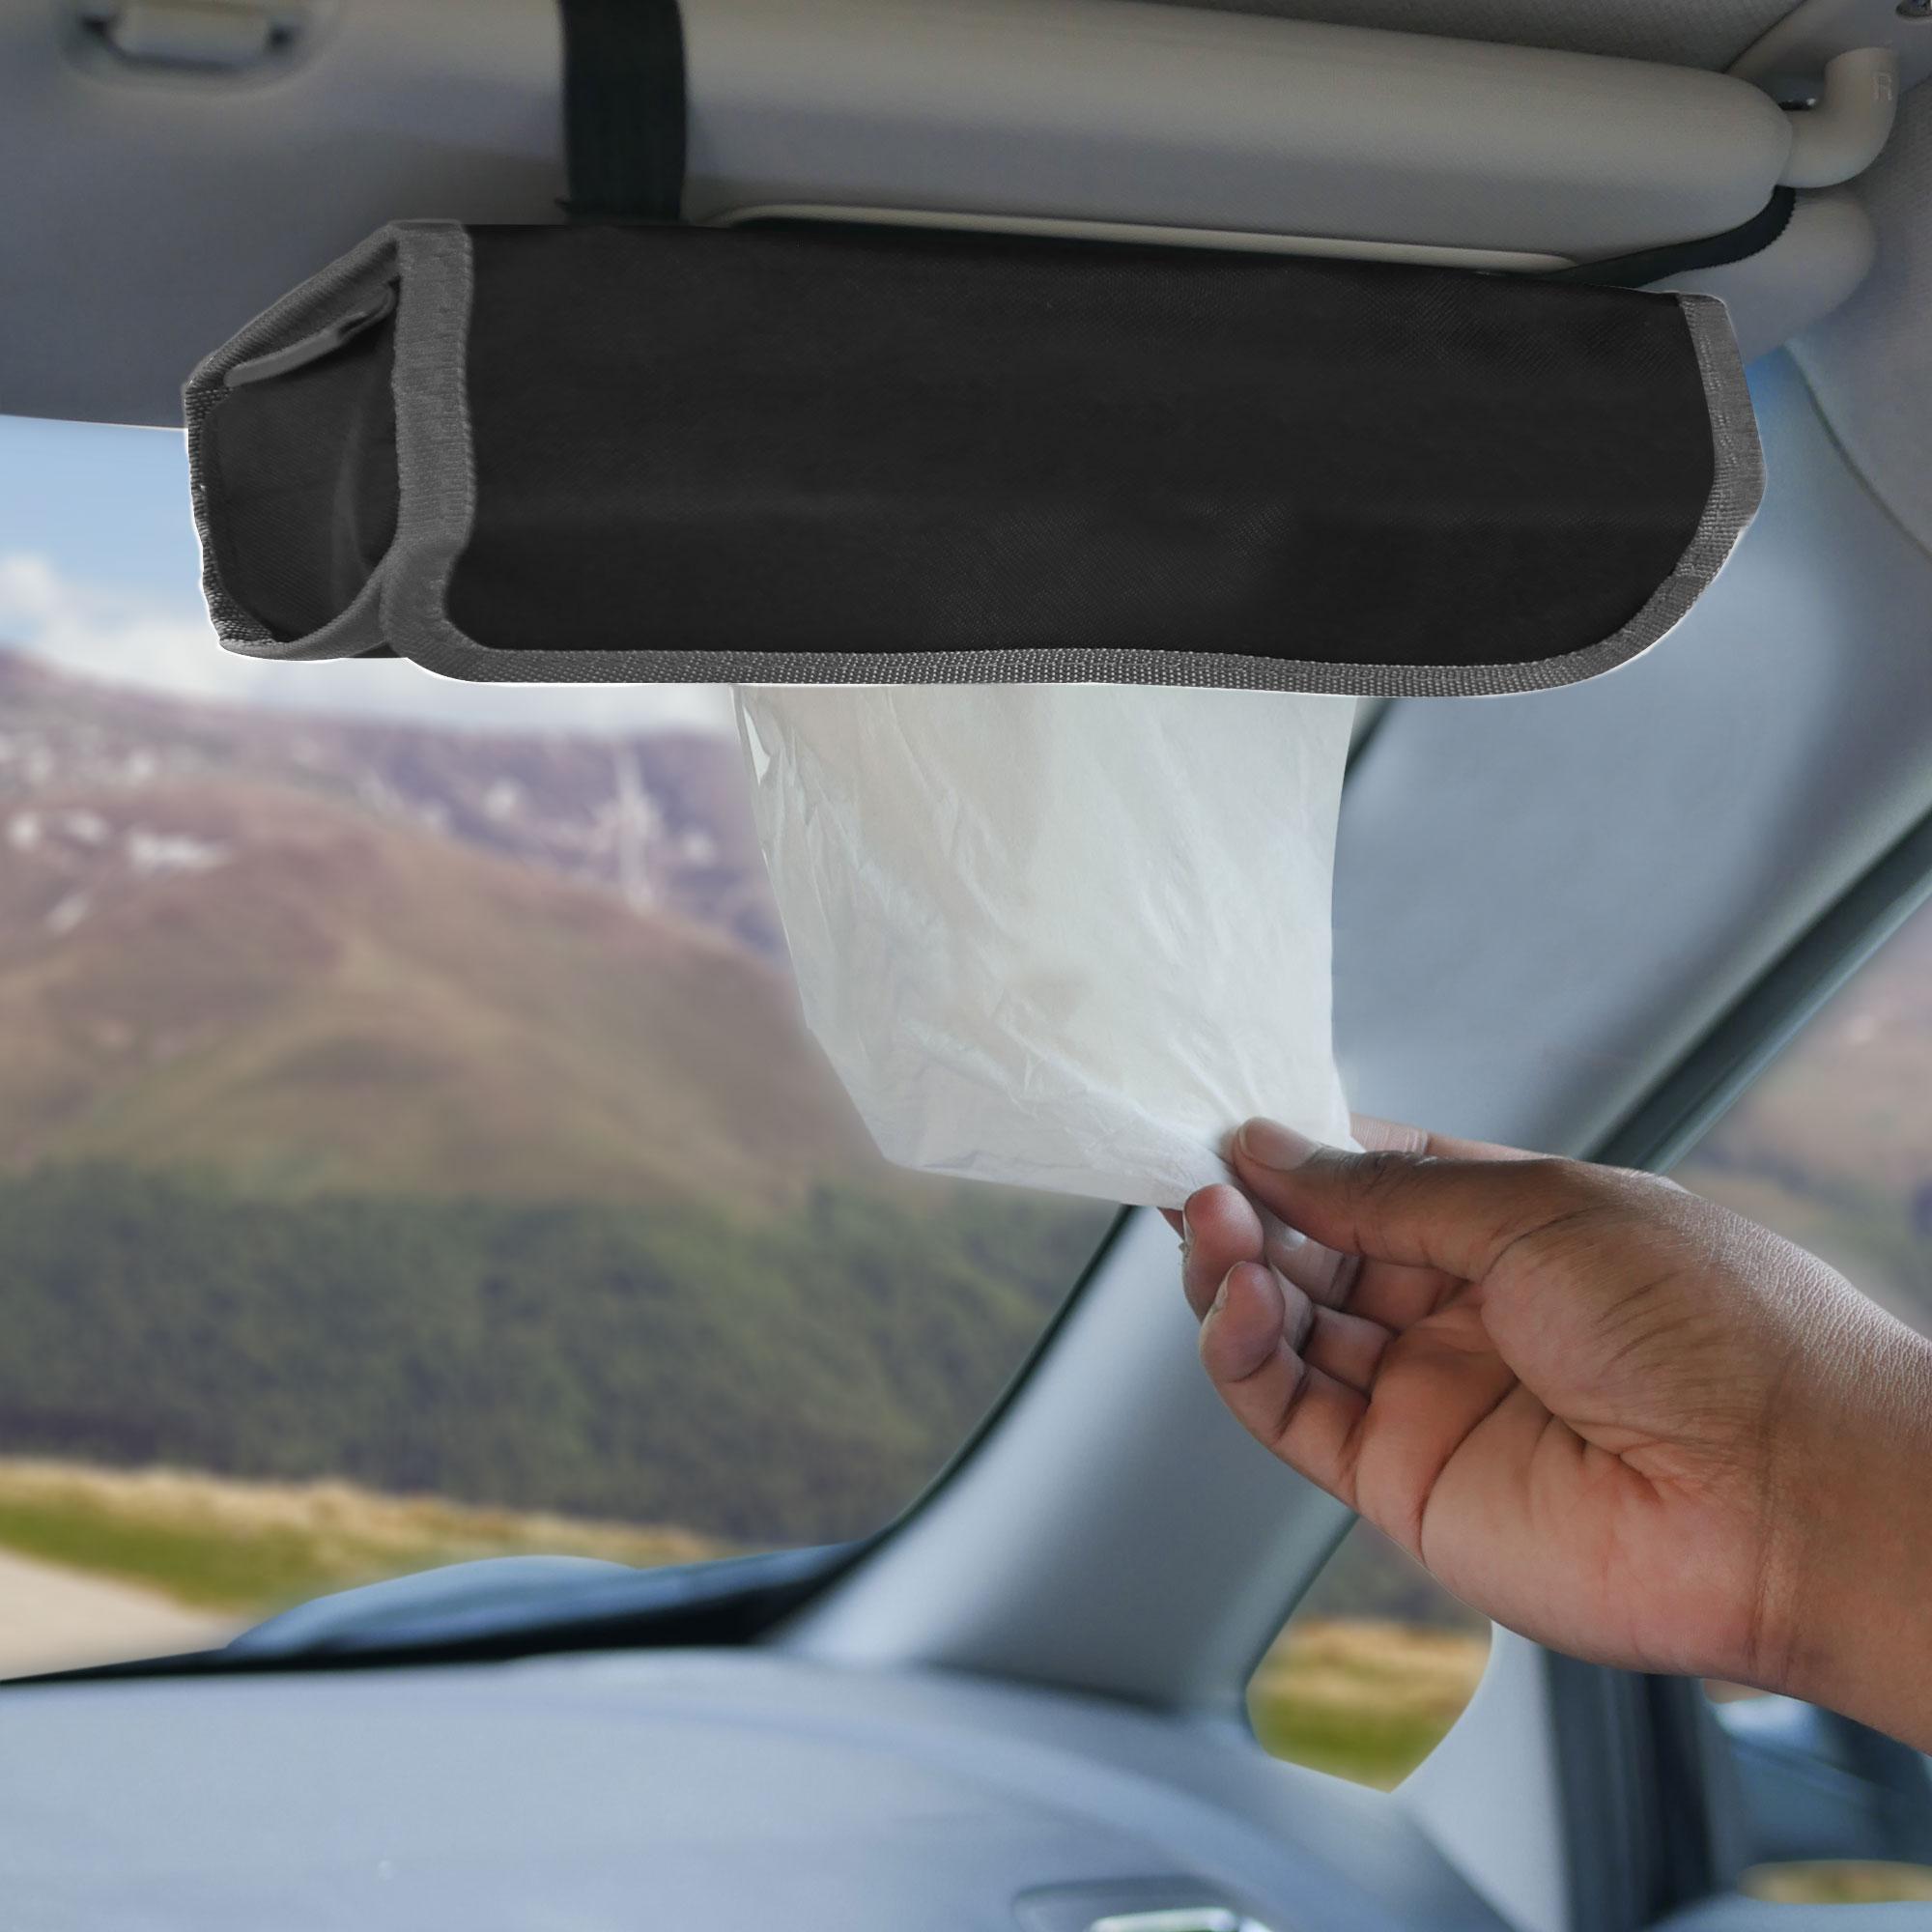 fh1136 grey black car organizer tissue dispenser